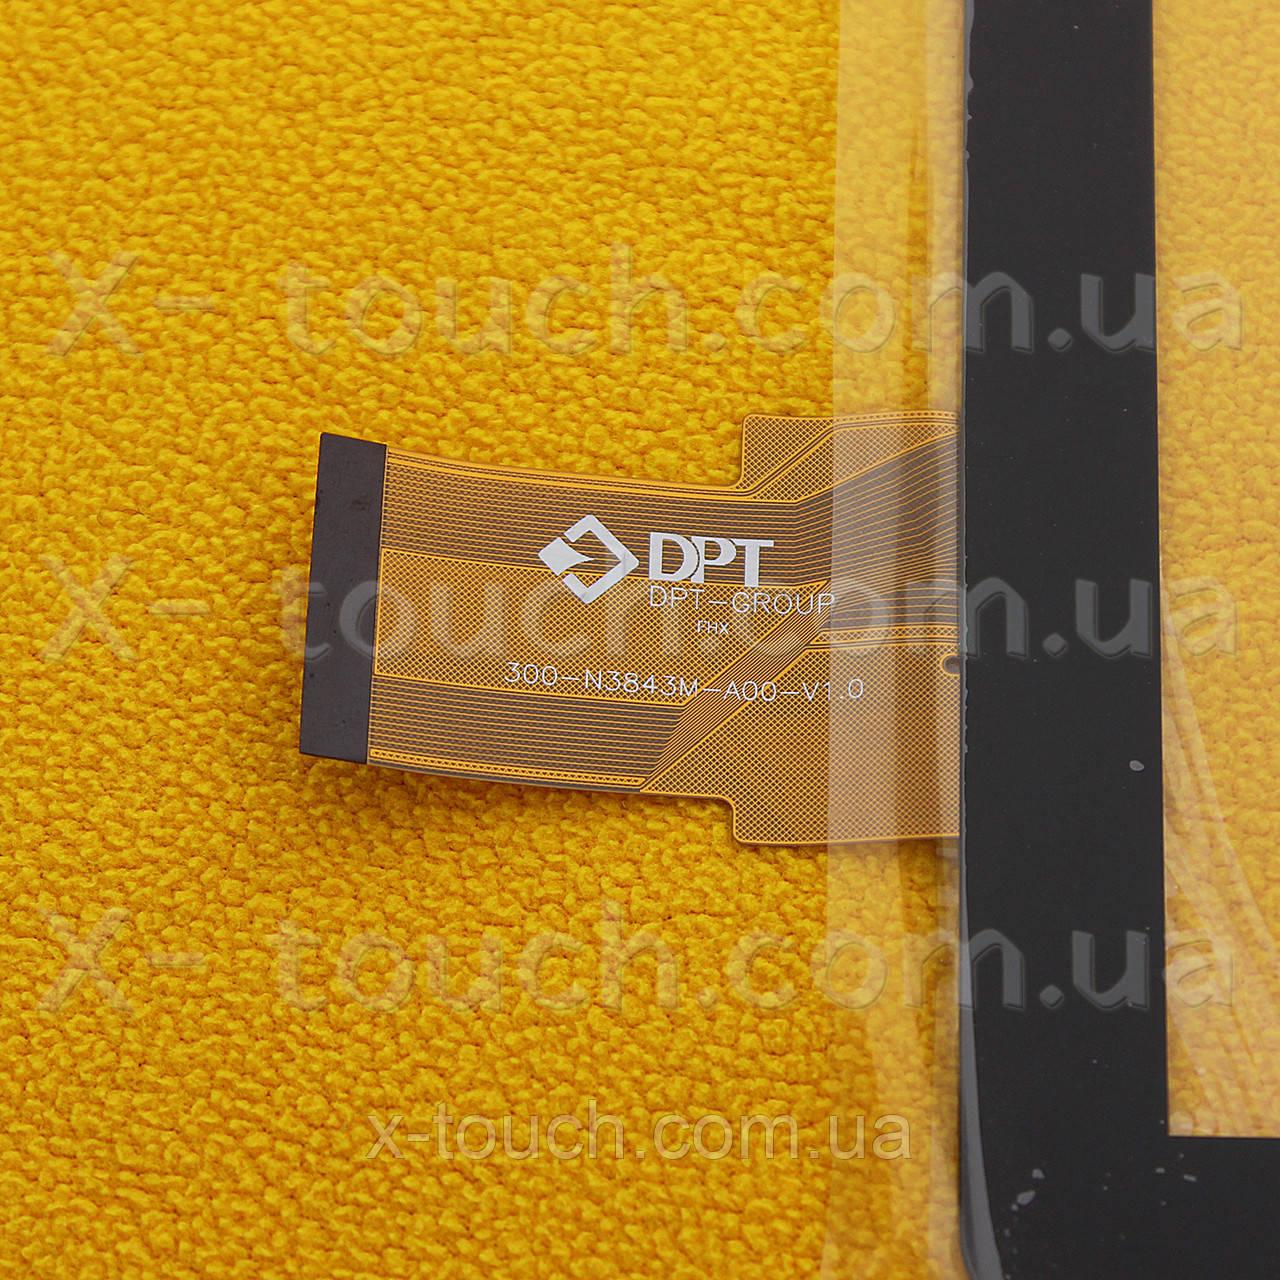 Тачскрин, сенсор  LHJ0206 FPC V01  для планшета